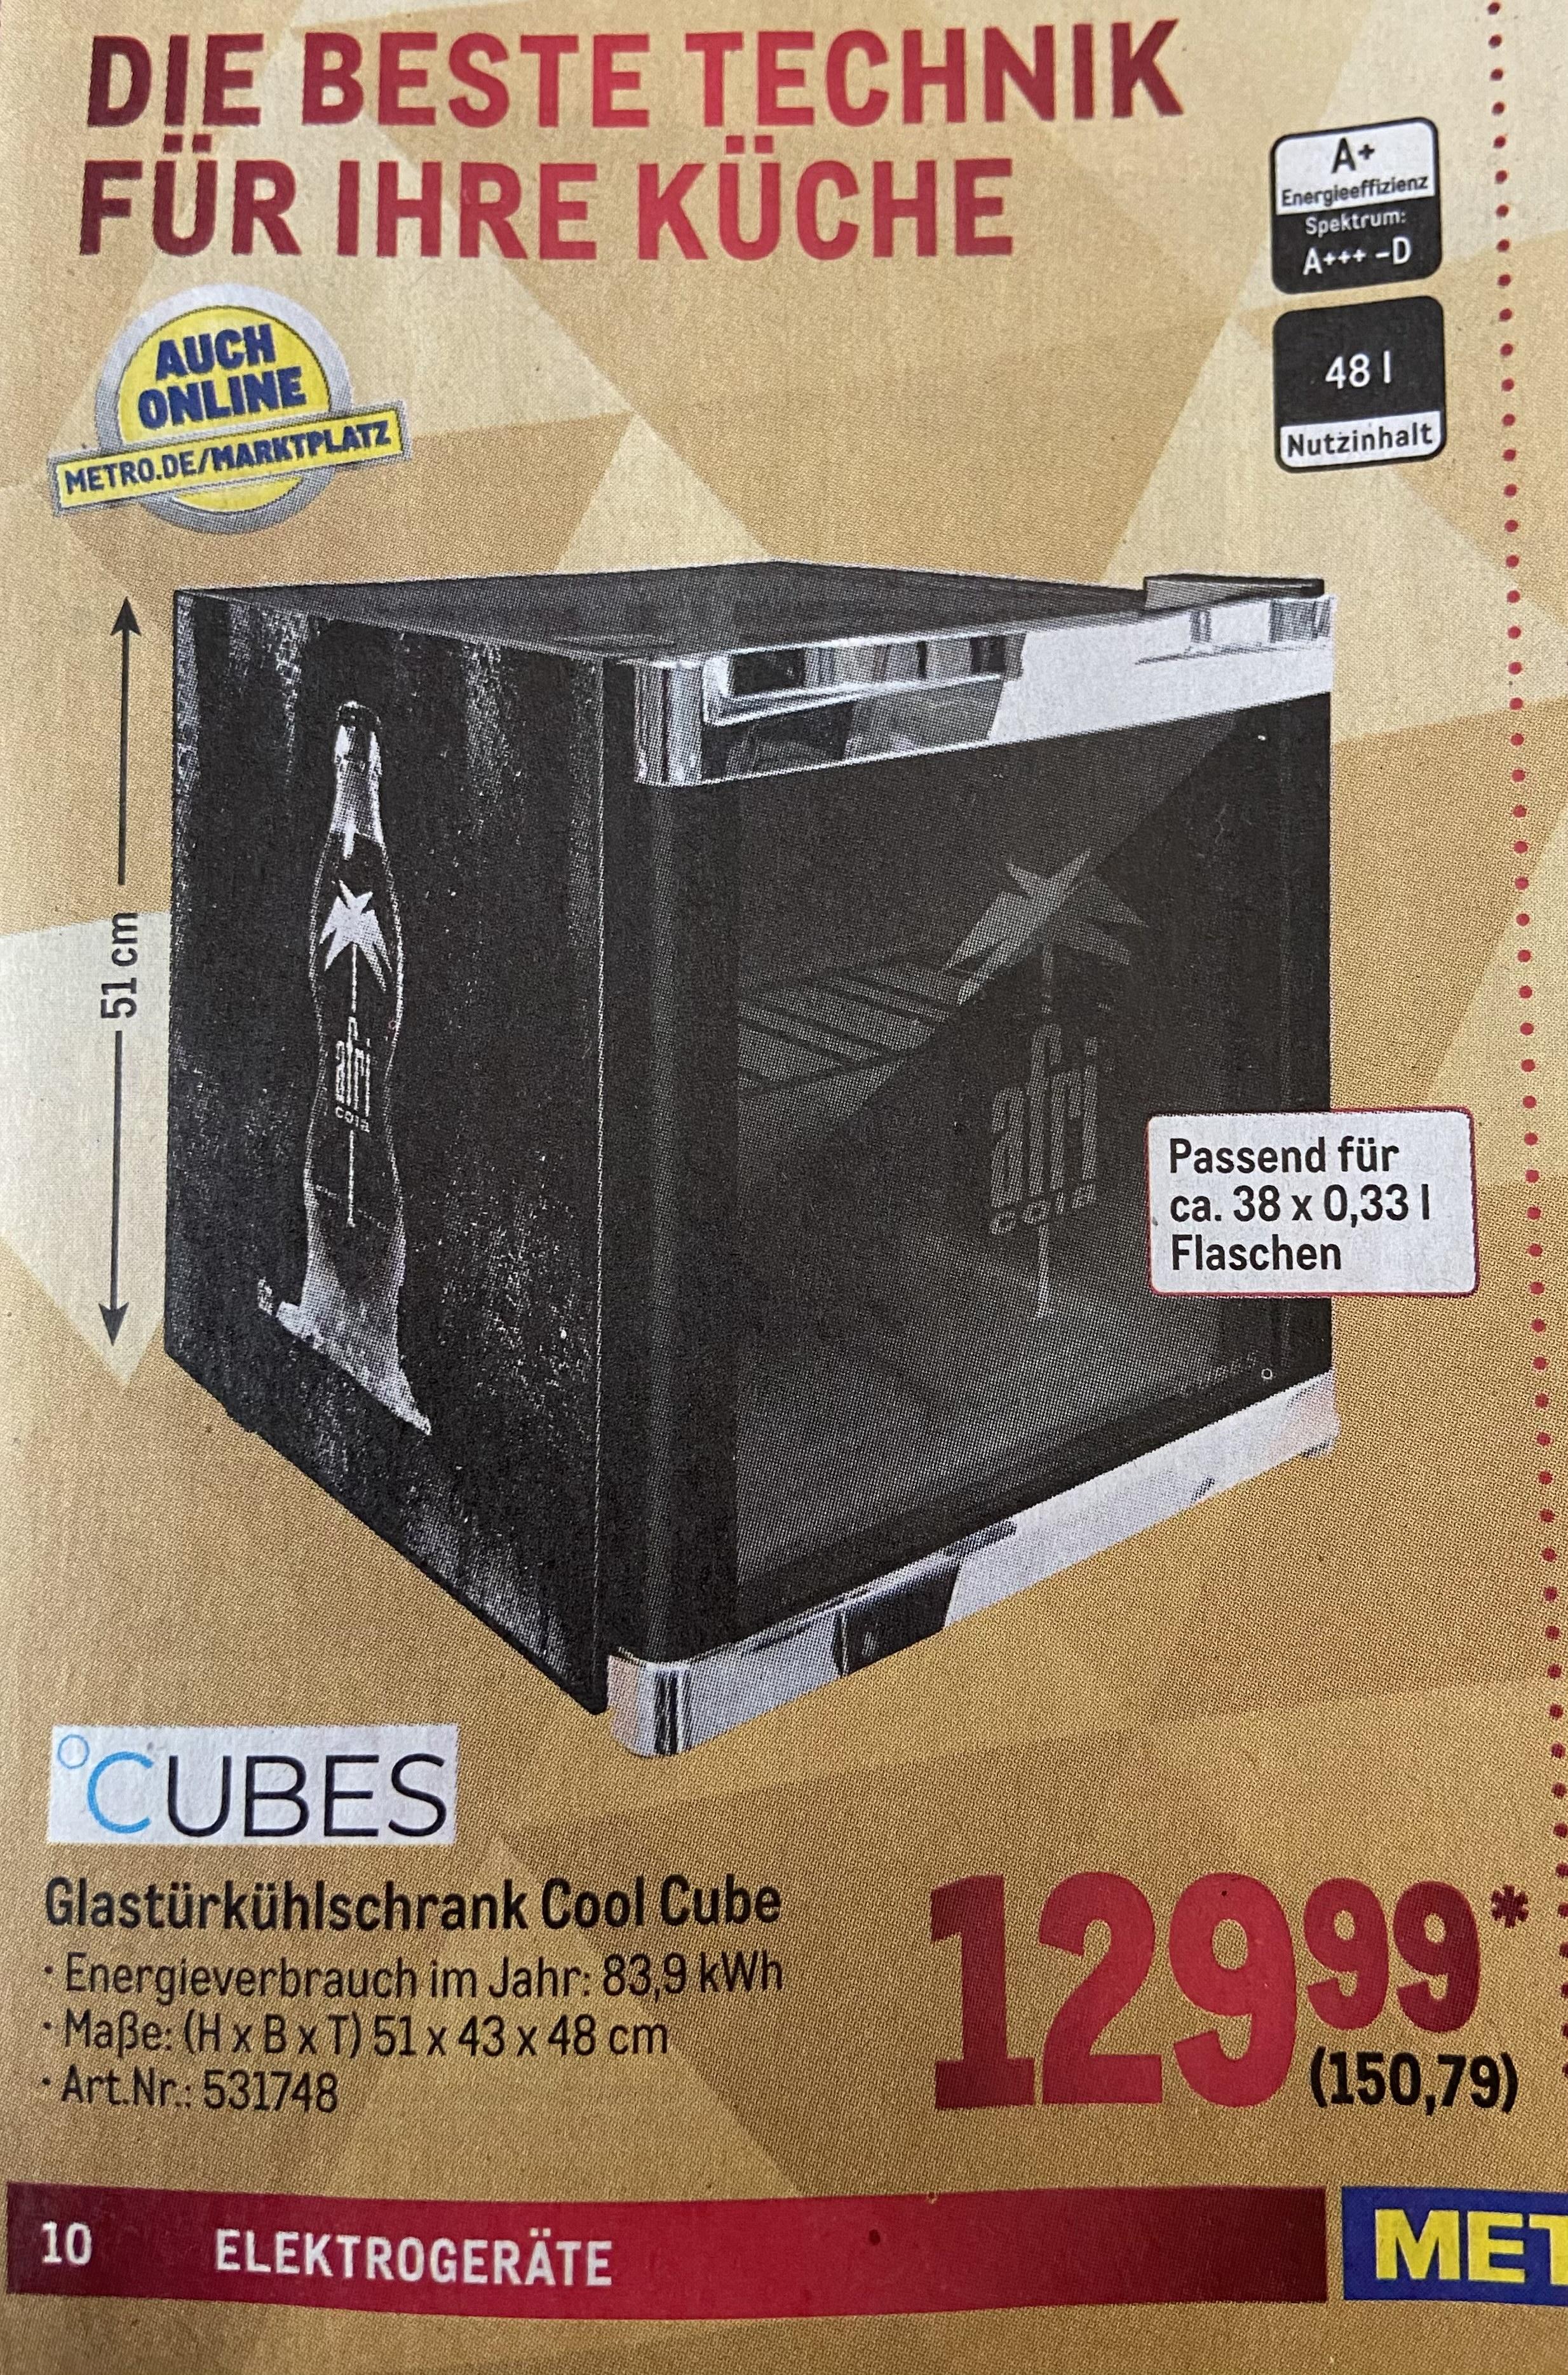 Metro-Deal Husky Cool Cube 48 L Glastürkühlschrank